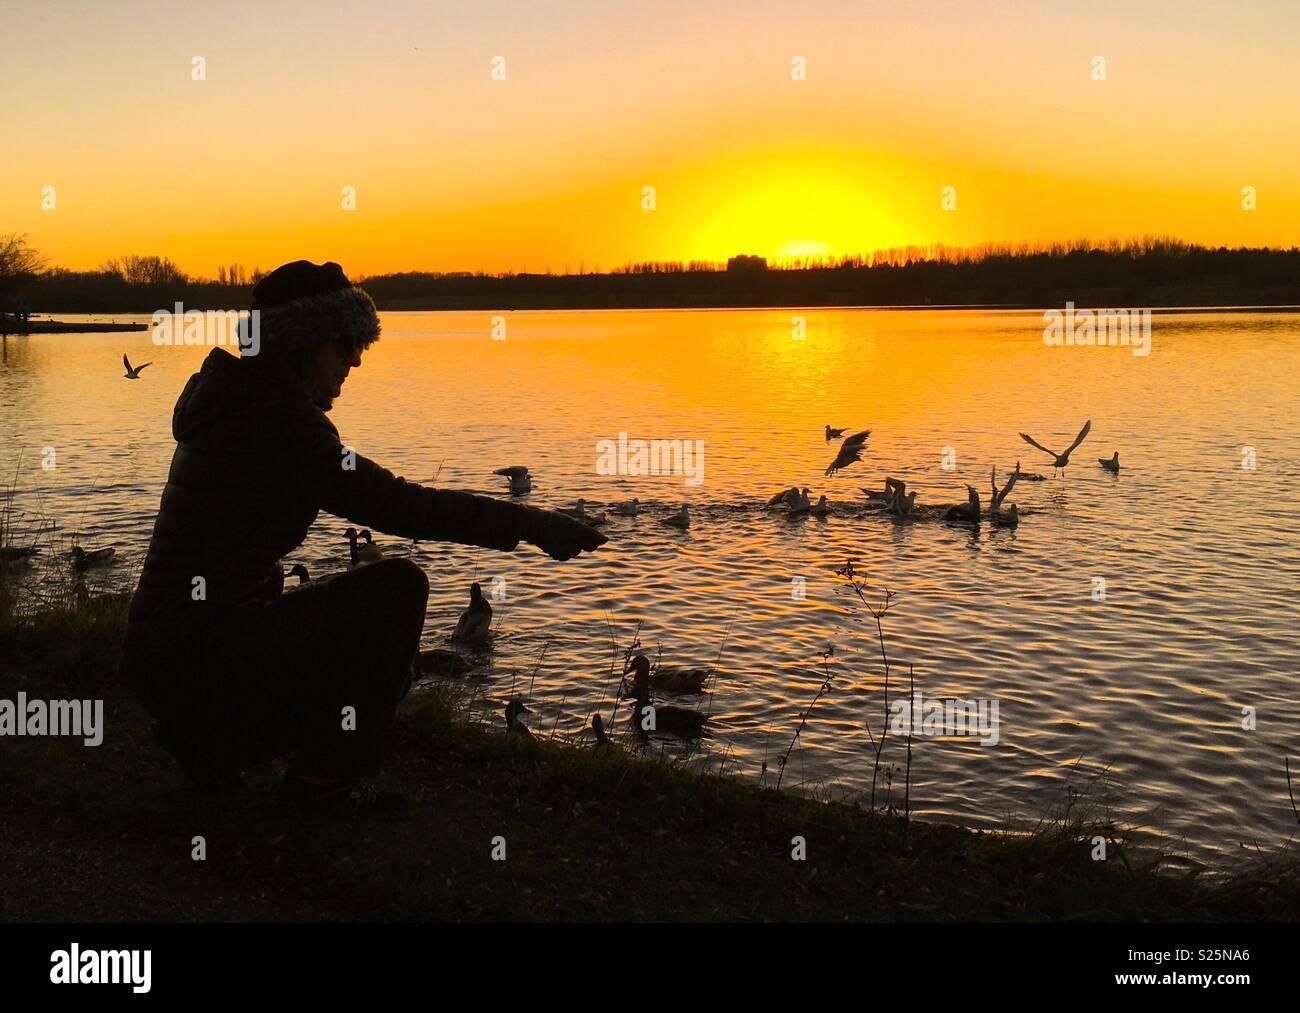 Lady with hat feeding birds at Willen Lake Milton Keynes at sunset - Stock Image